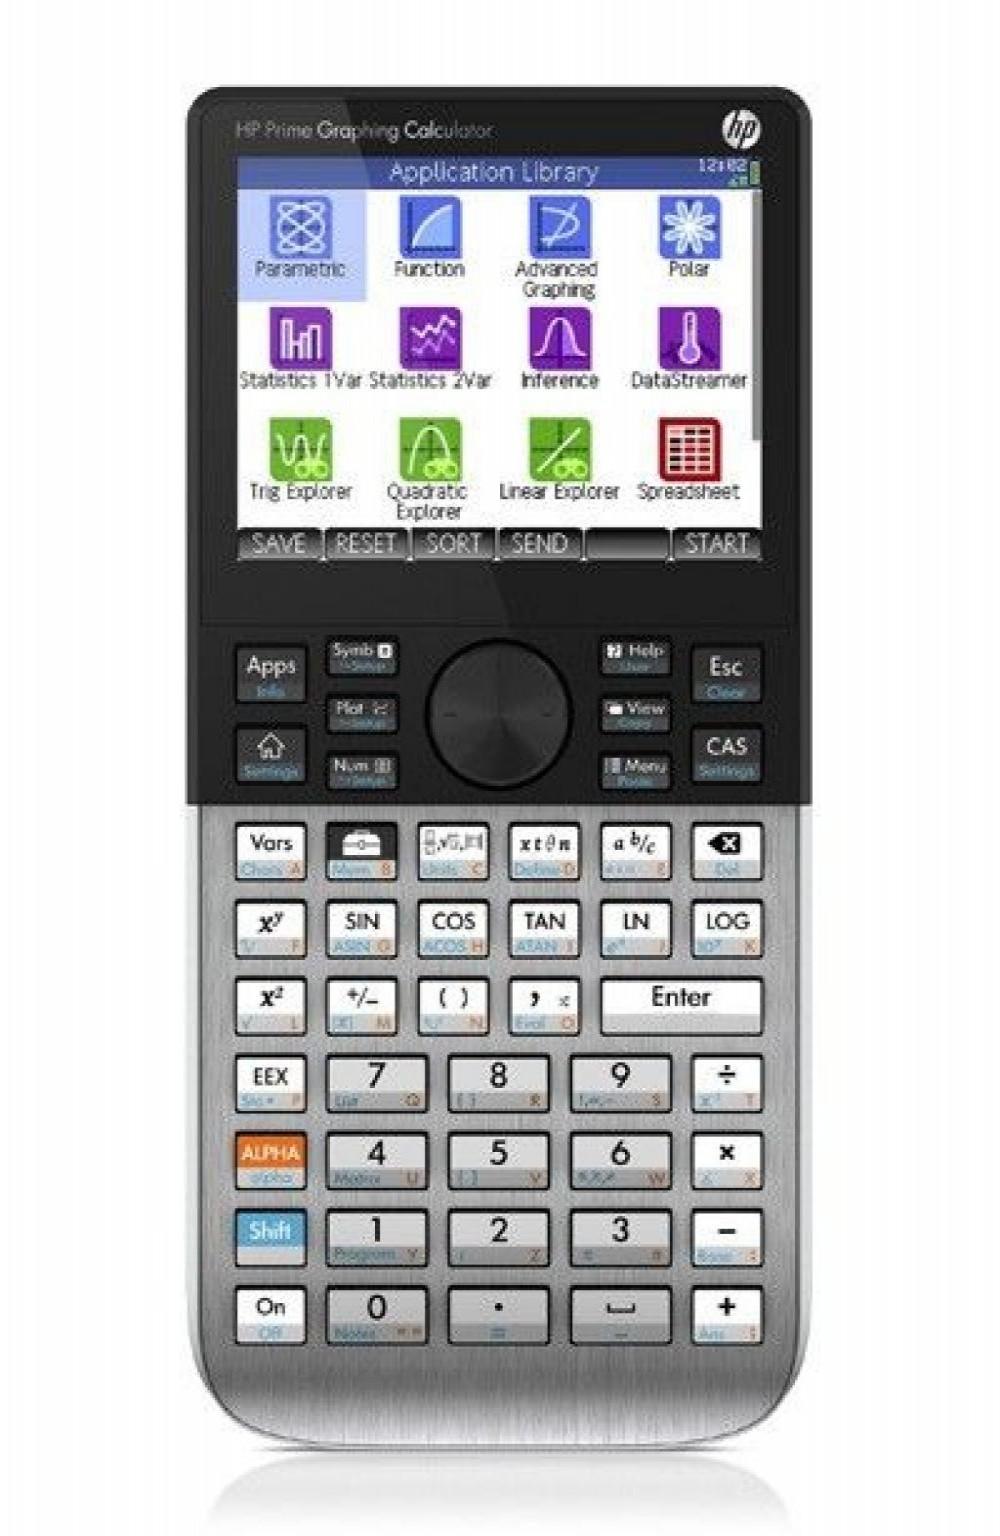 Calculadora HP Prime G2 Gráfica 2AP18AA#B1K